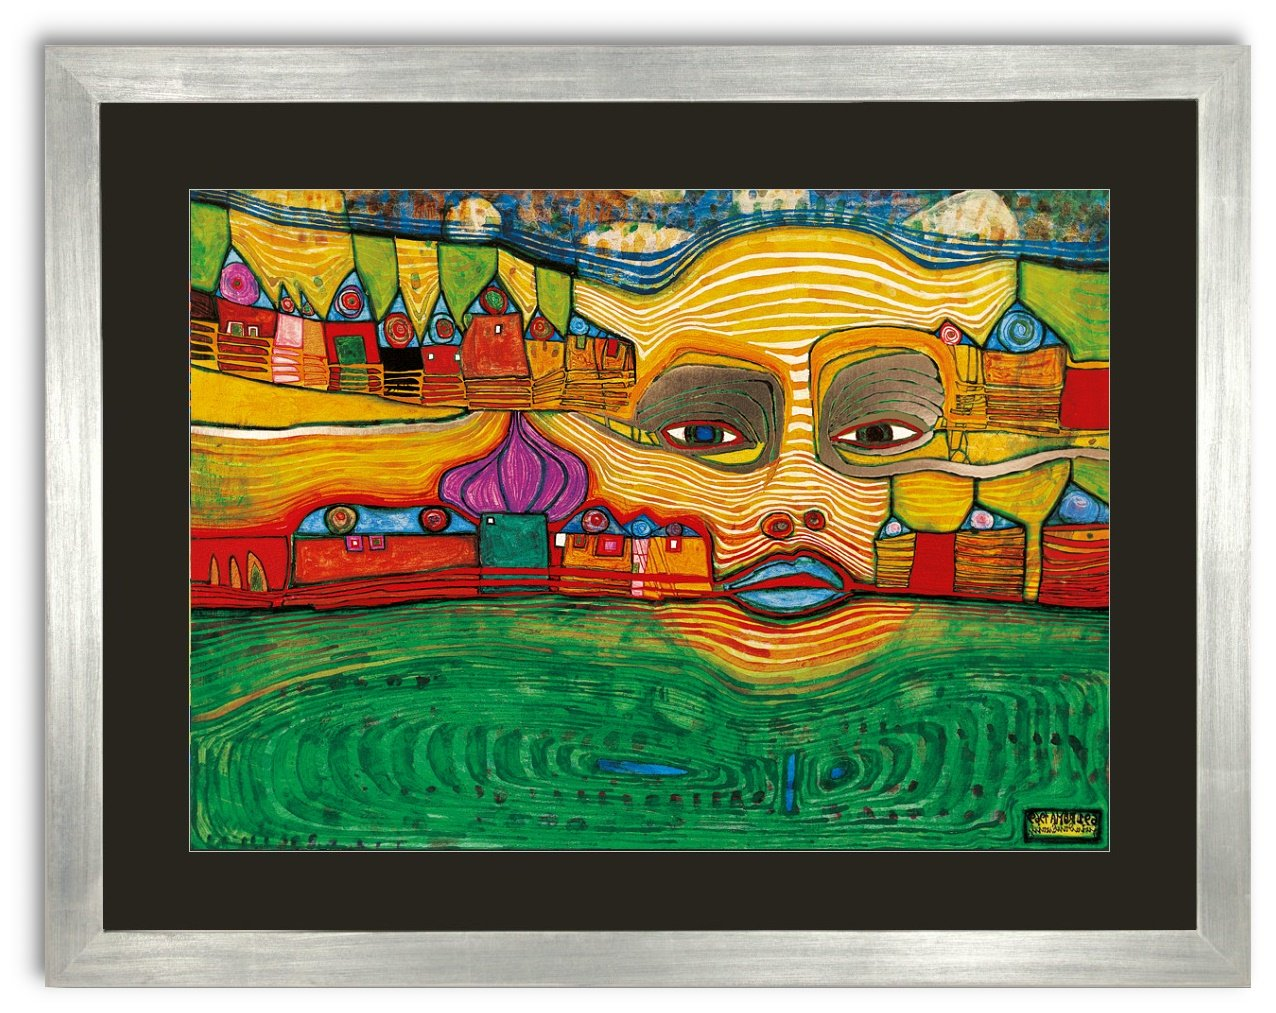 Kunstdruck Bild Hundertwasser IRINALAND ÜBER DEM DEM DEM BALKAN 75 x 59 cm Galeriebild mit Blattsilber Rahmen ++ SALE ++ 2d2d79